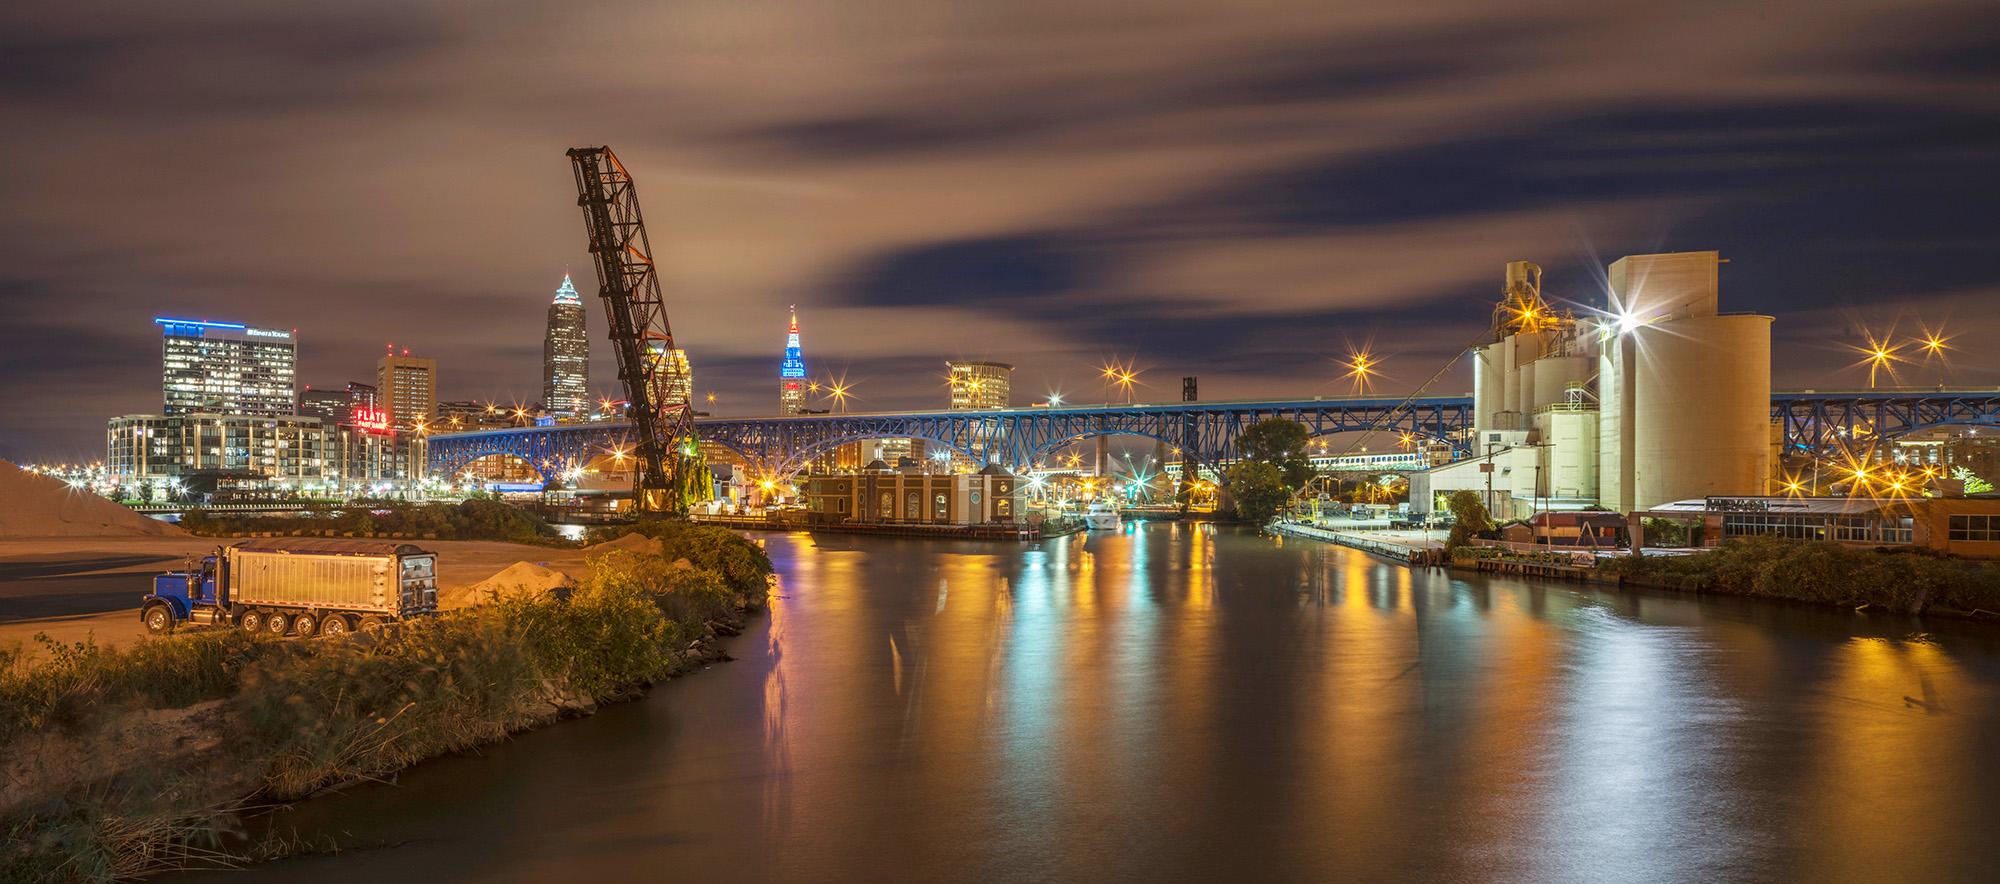 013_Peter_Essick-Cuyahoga_River_Ohio.jpg